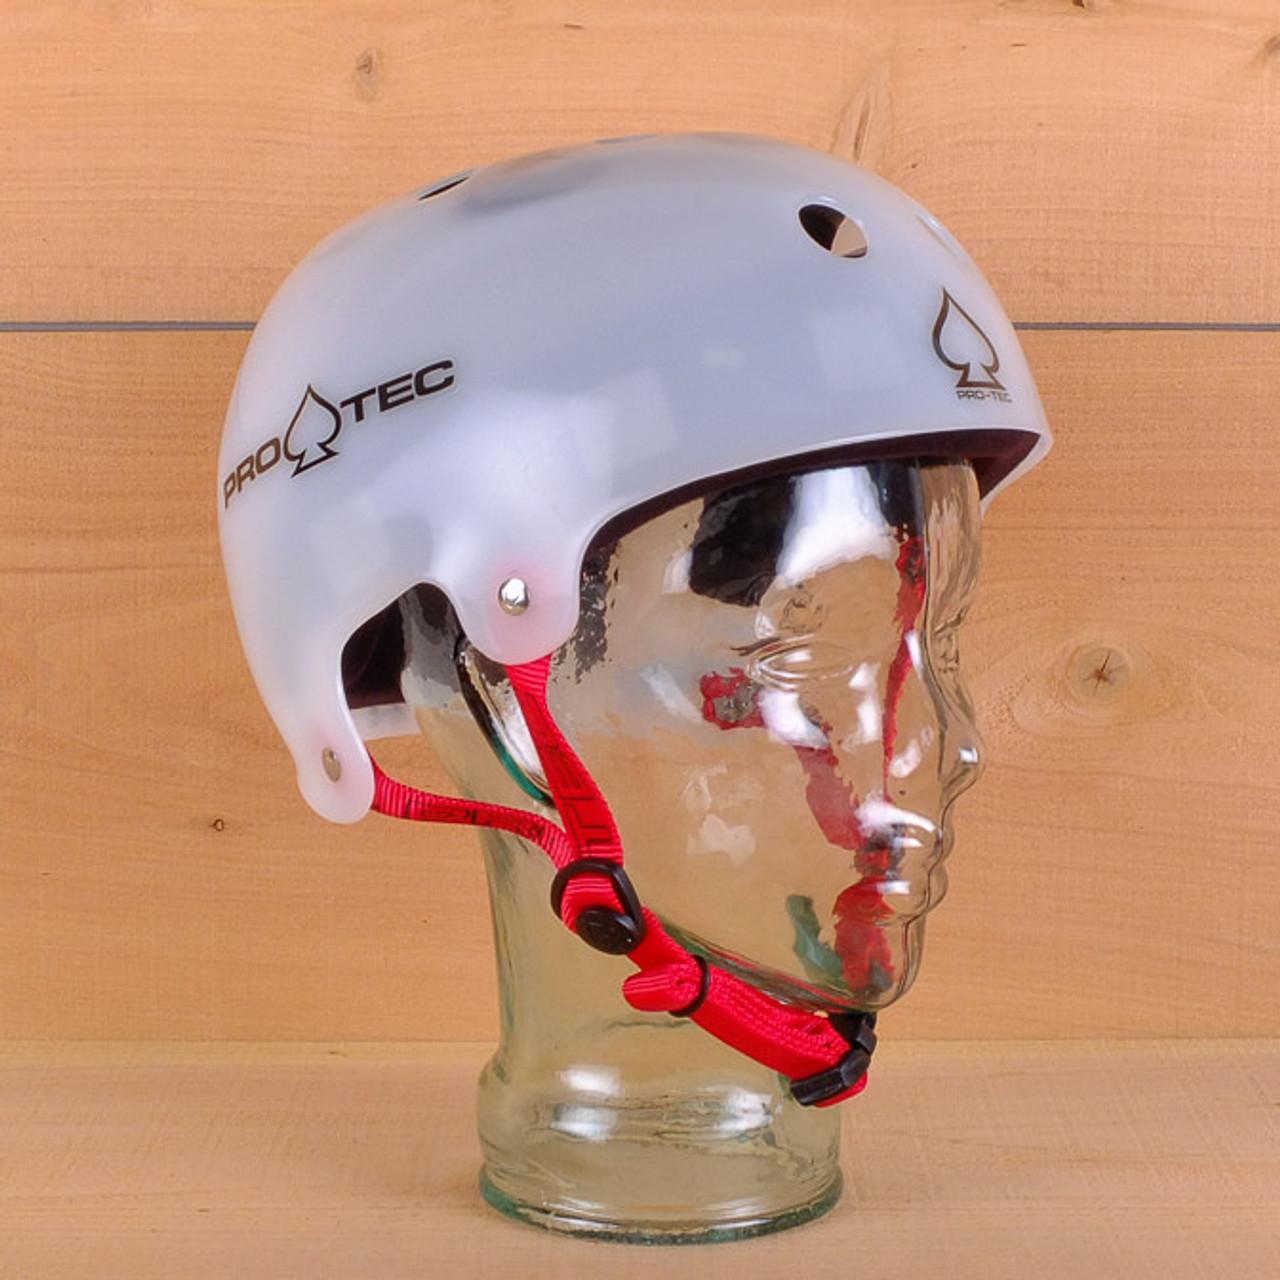 Pro-Tec Classic Bucky Lasek Skateboard Skate Helmet LARGE Translucent White